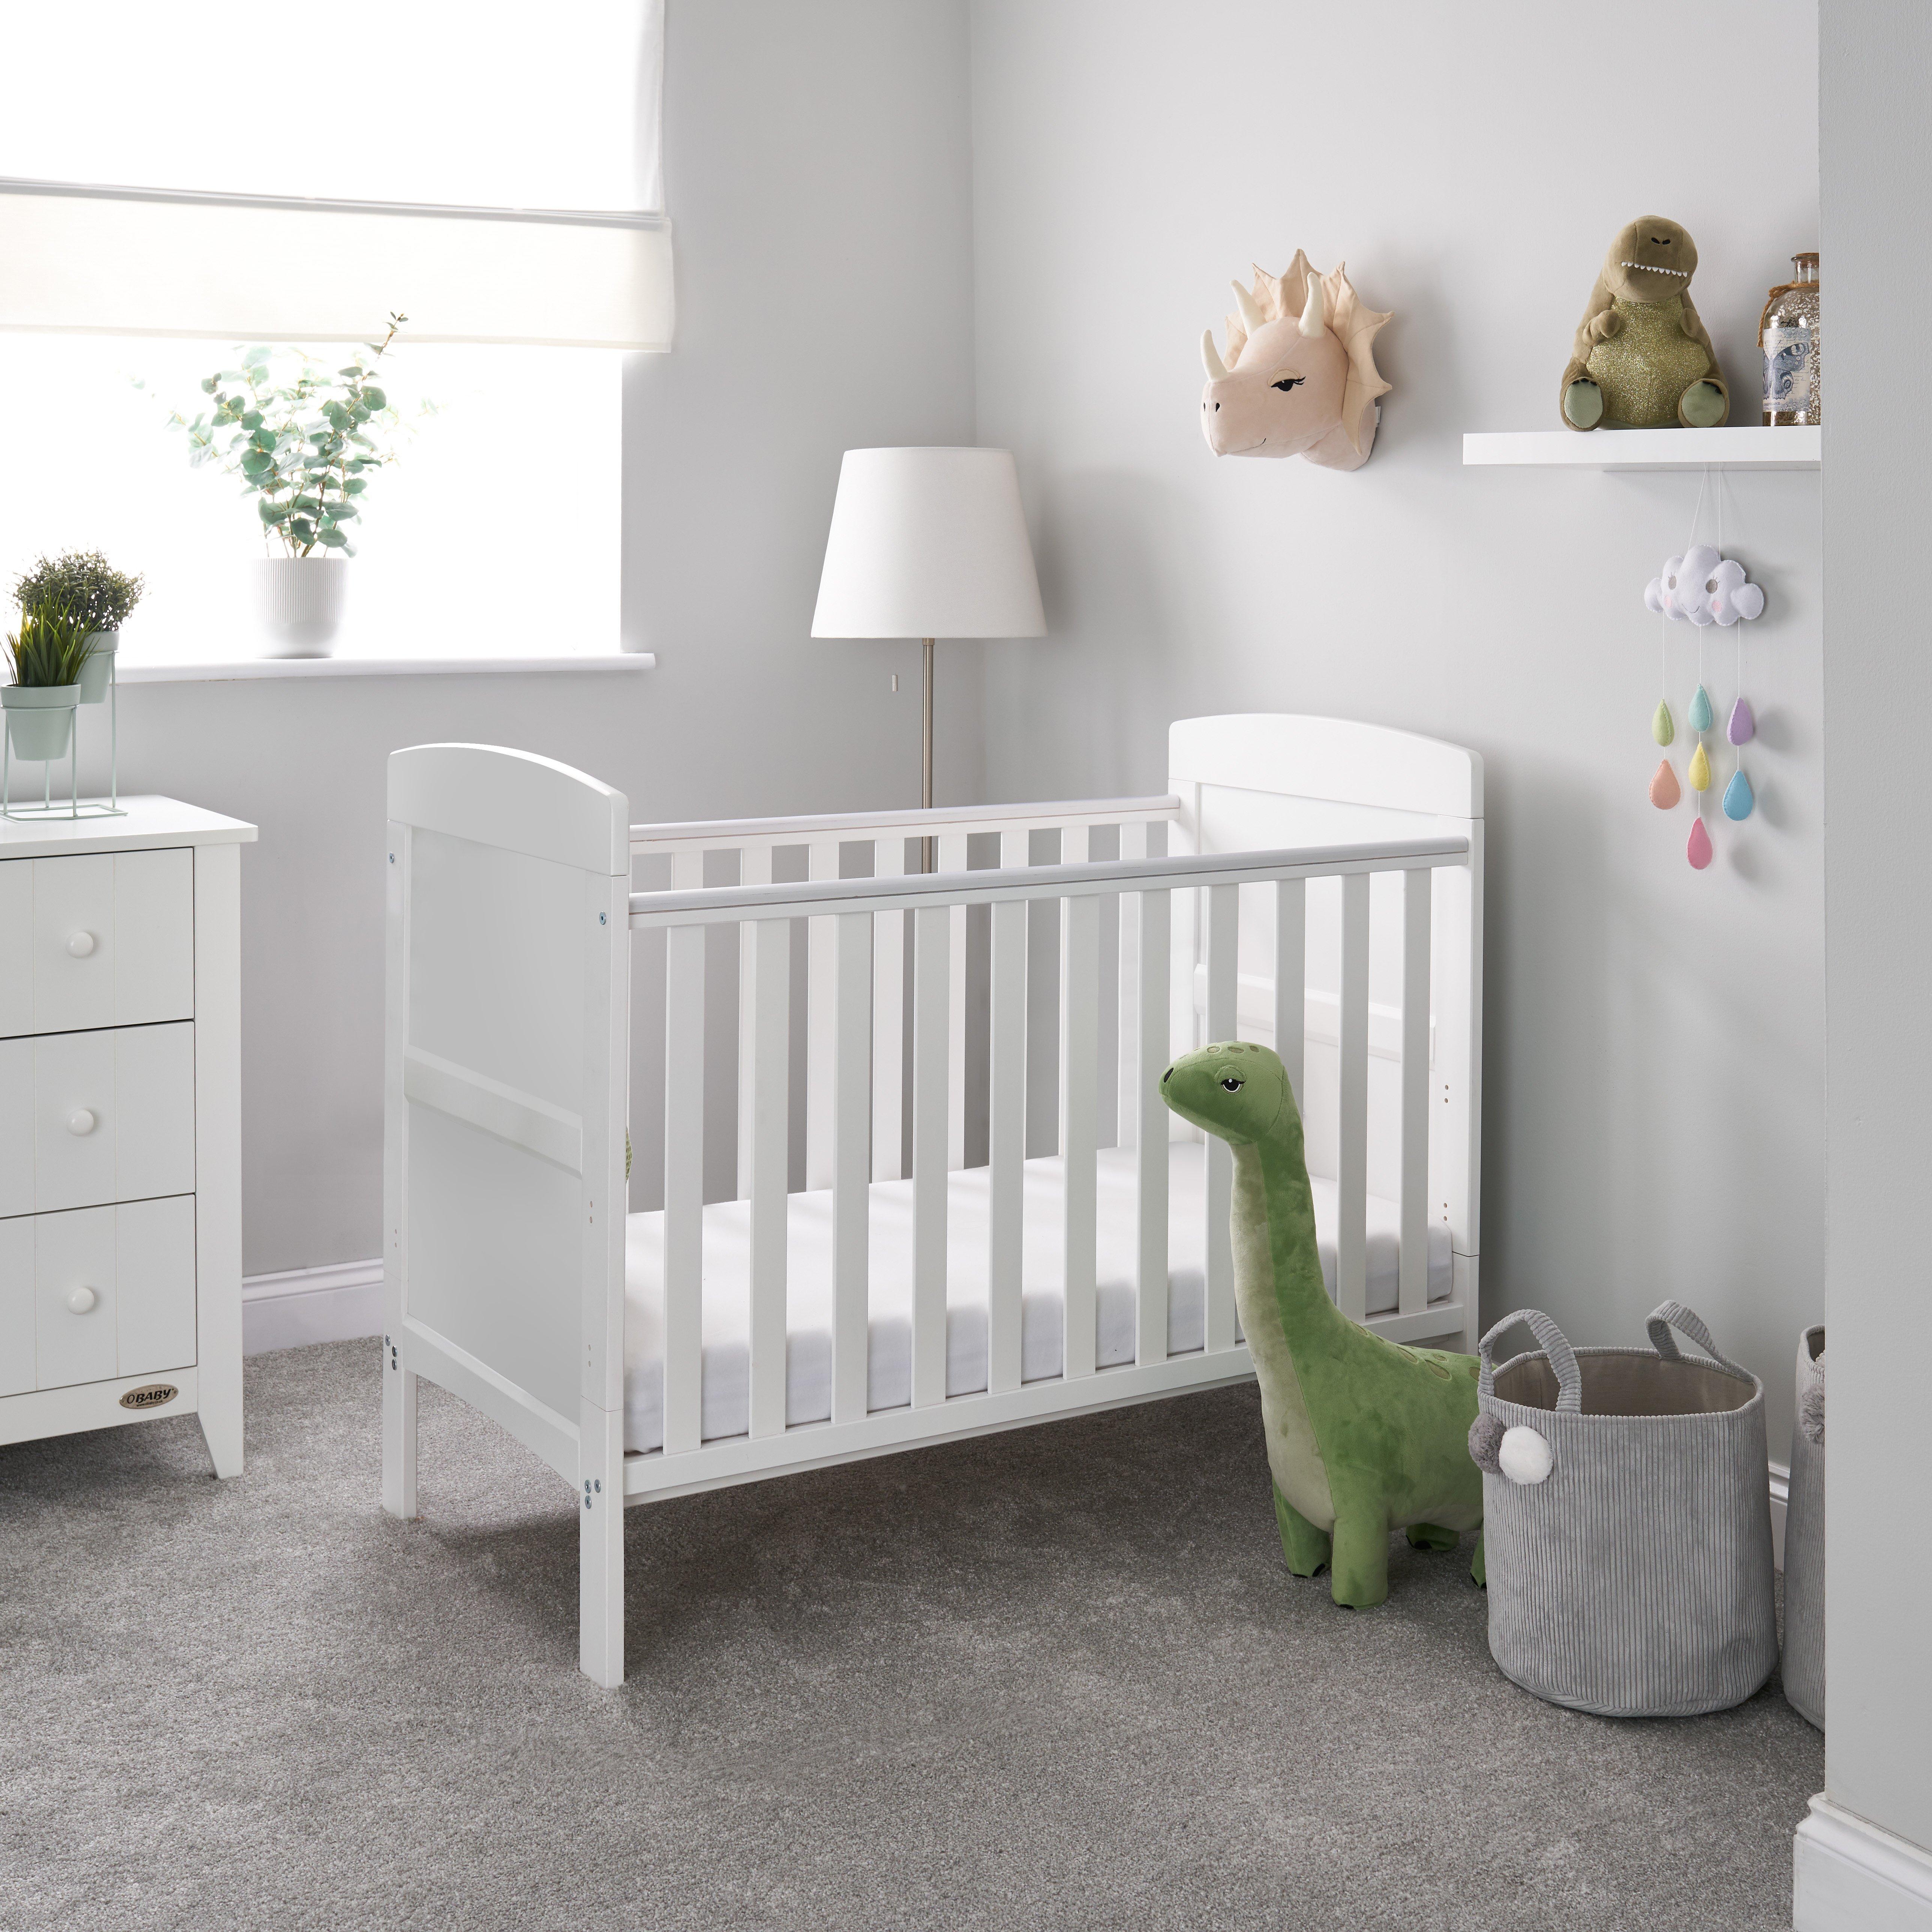 Obaby Grace Mini Cot Bed - White